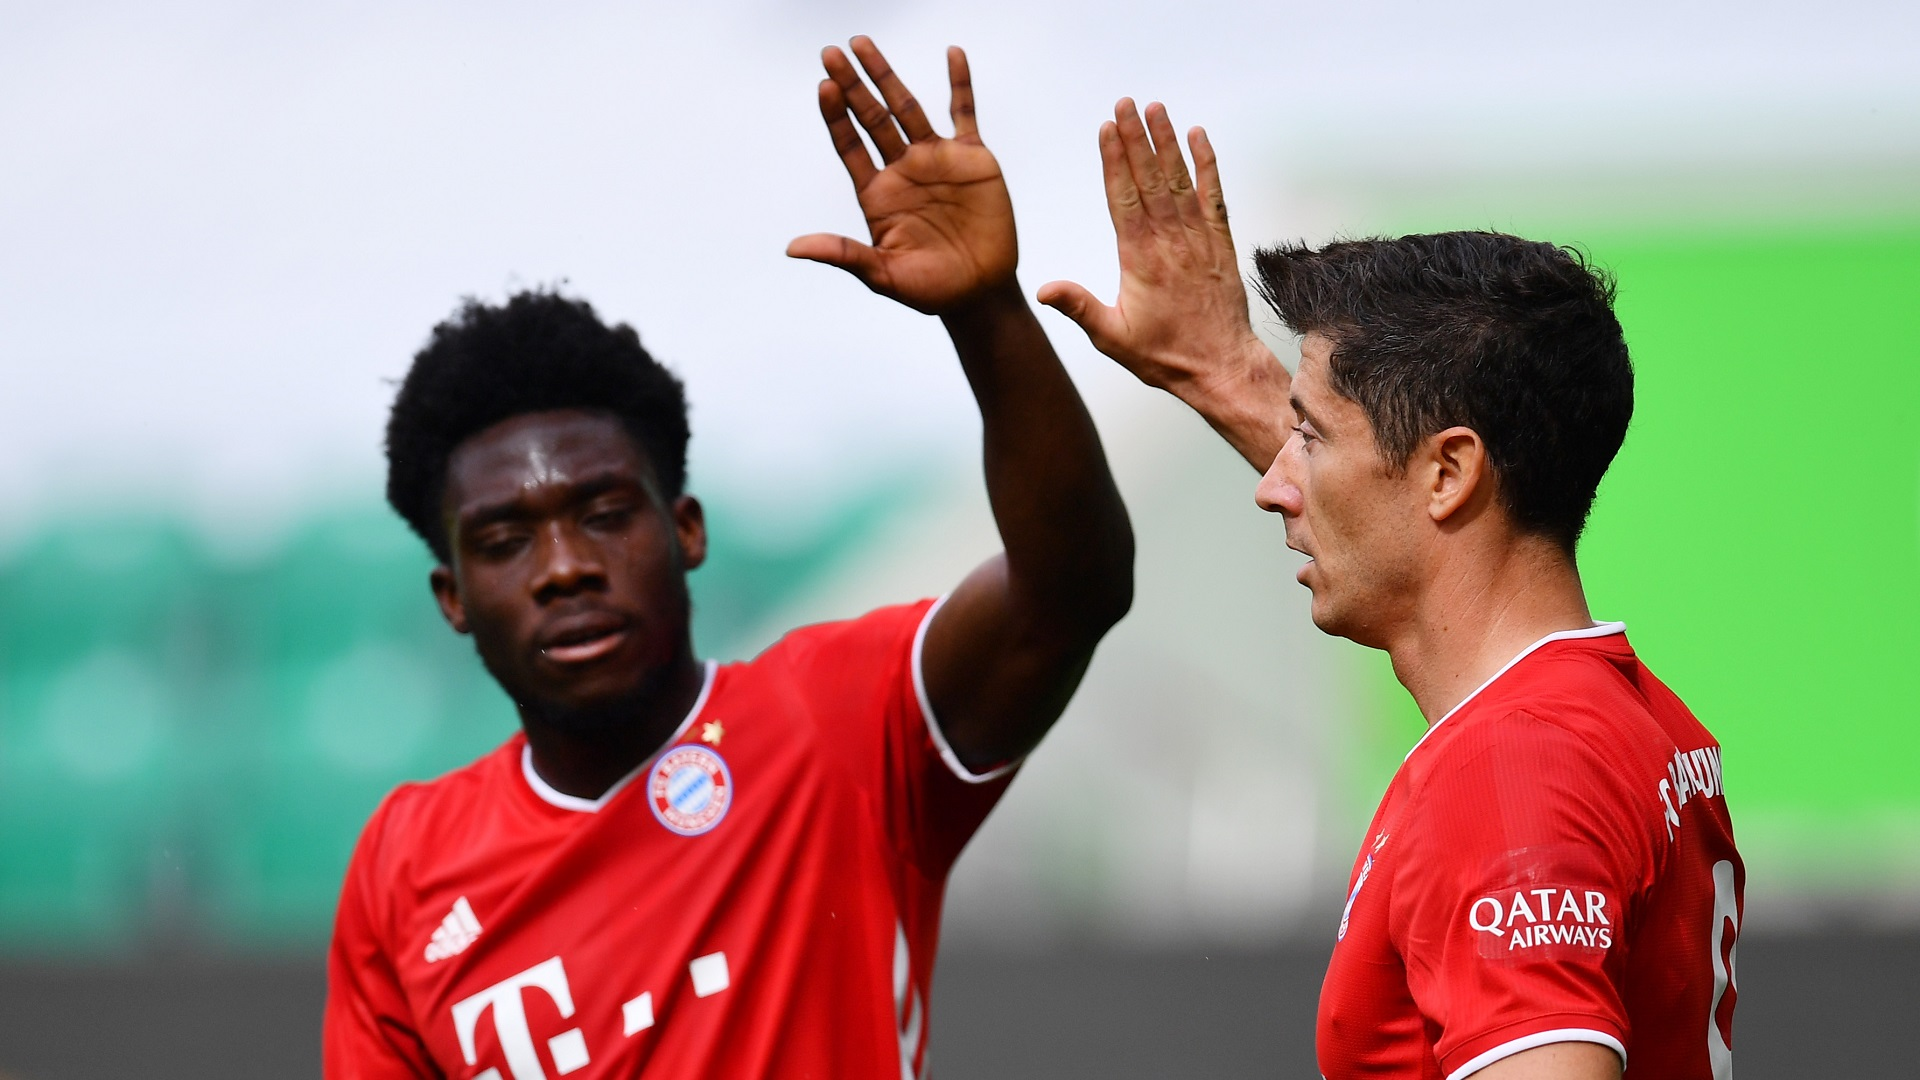 Davies: Lewandowski not winning Ballon d'Or upset Bayern players, this was his year